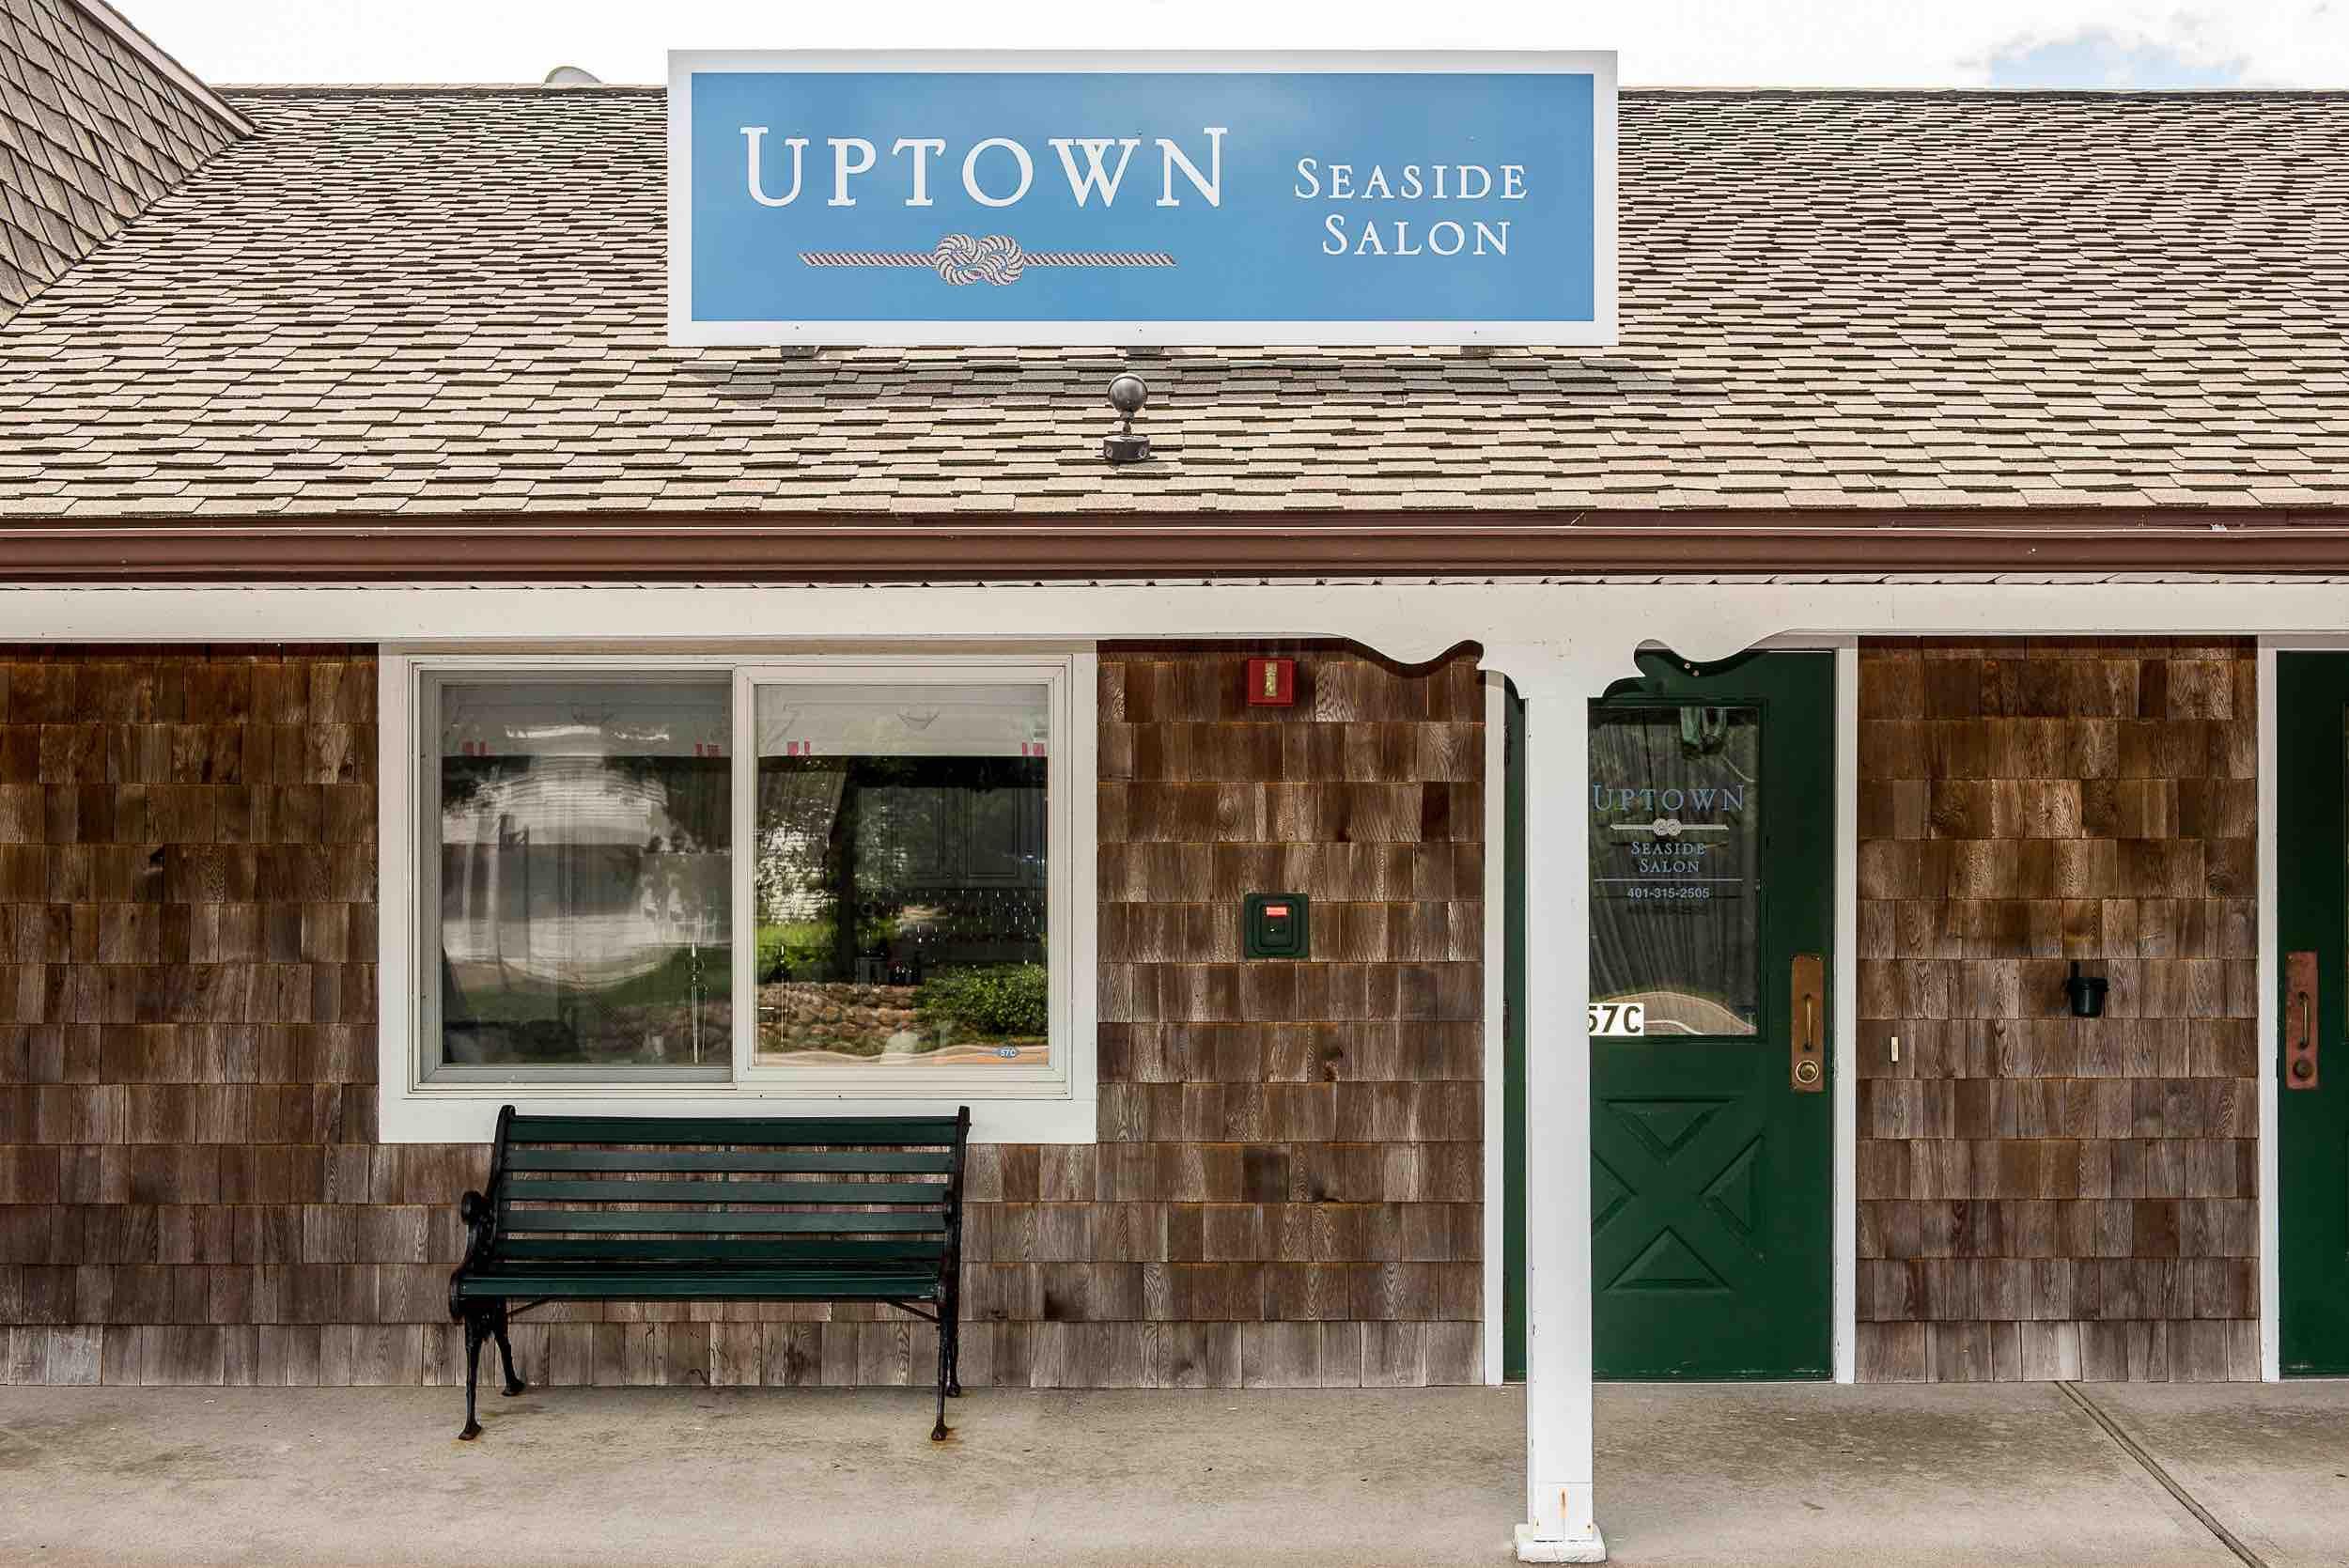 Uptown Seaside Location